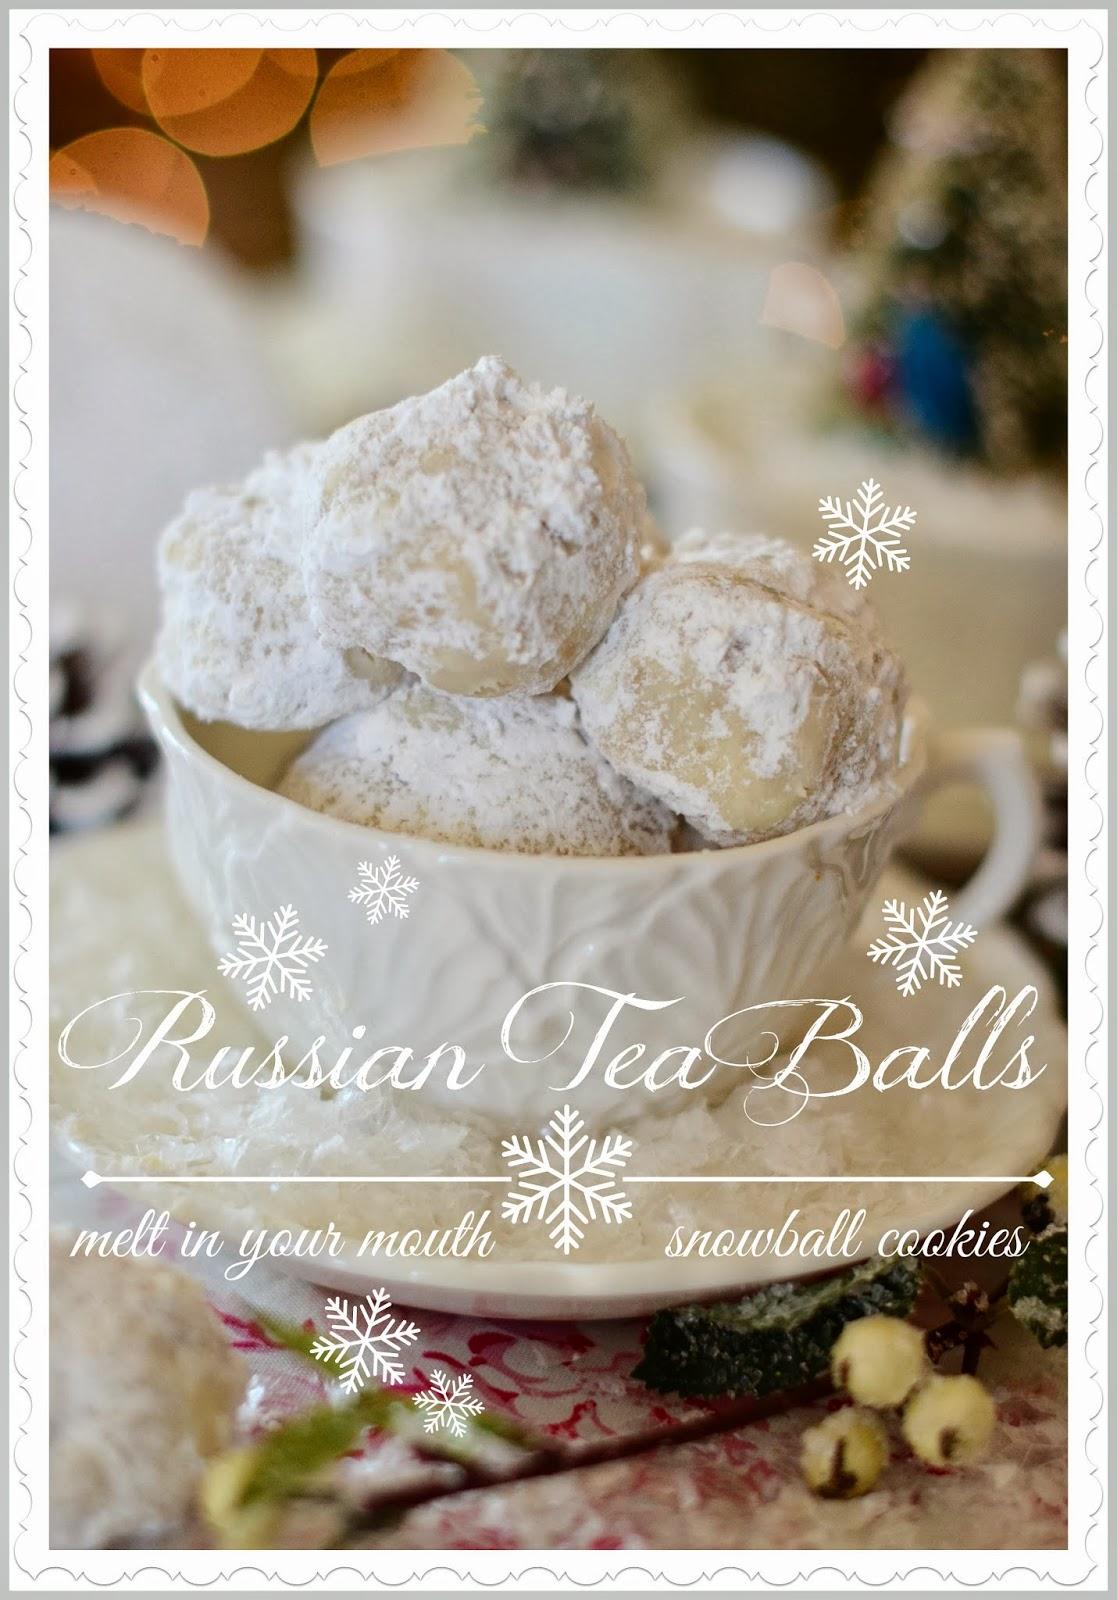 Russian Tea Ball Cookies Stonegable